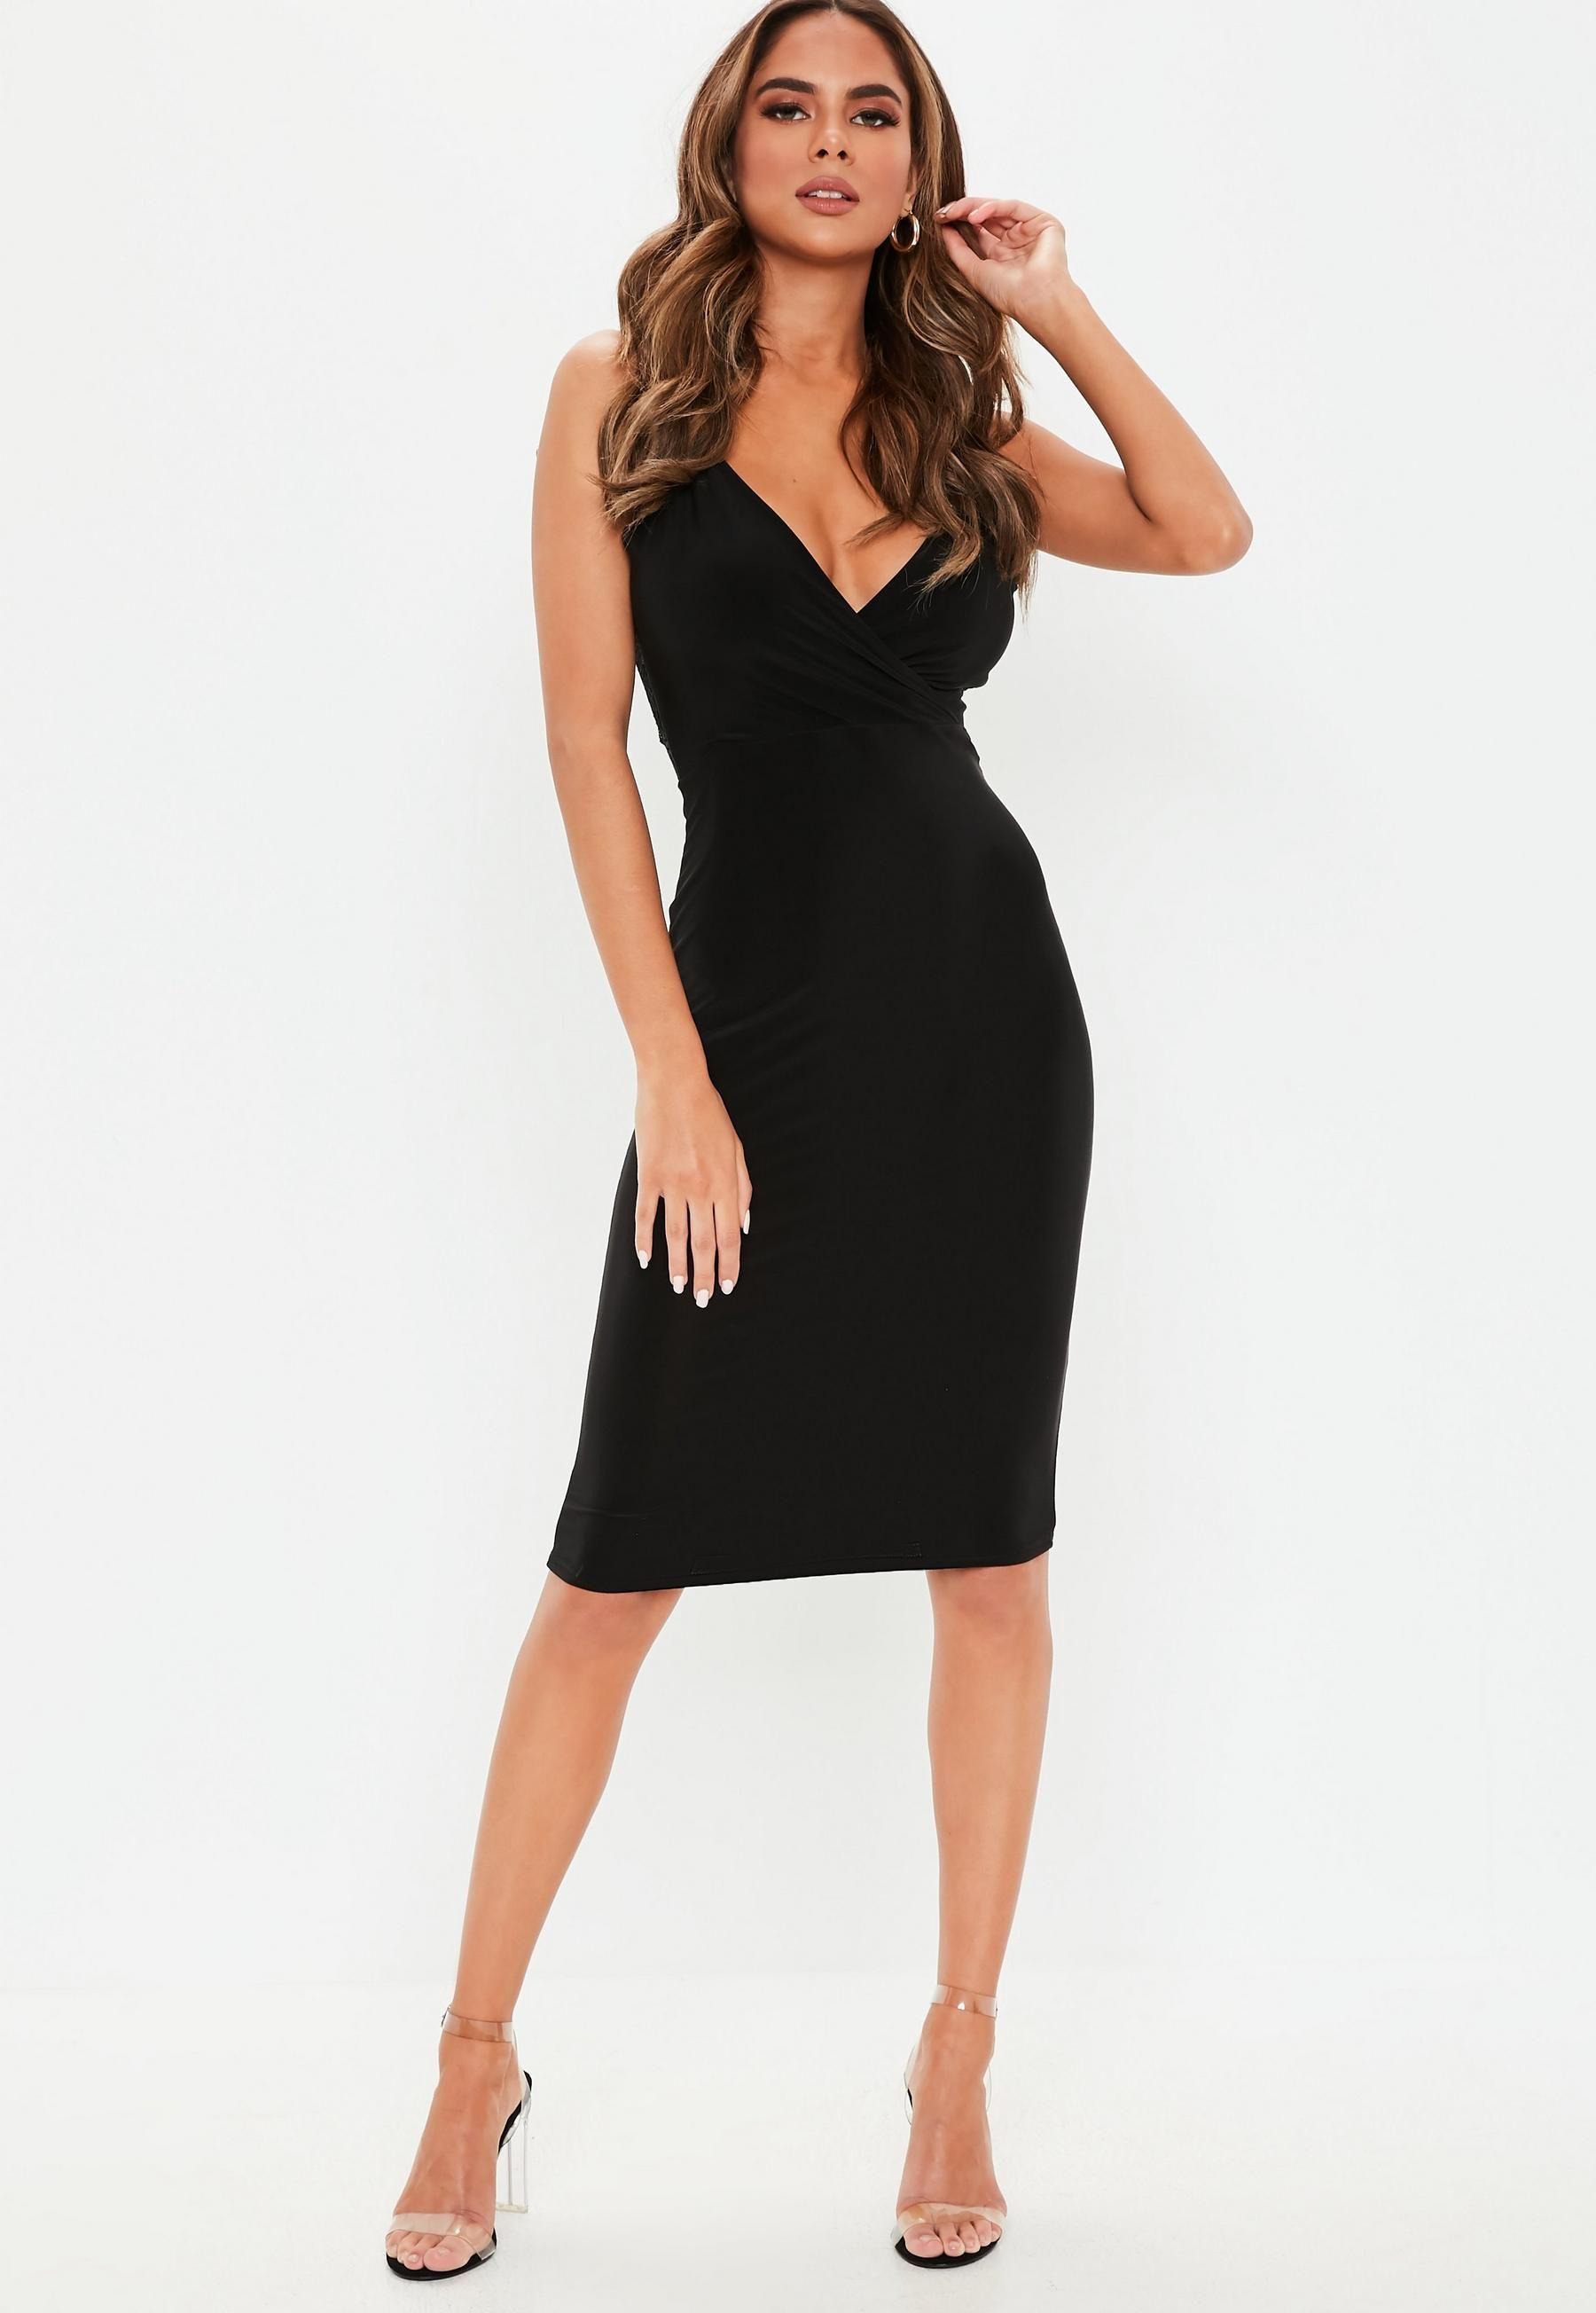 Black Strappy Lace Back Slinky Midi Dress Missguided Trending Dresses Women Dress Online Dresses [ 2608 x 1800 Pixel ]